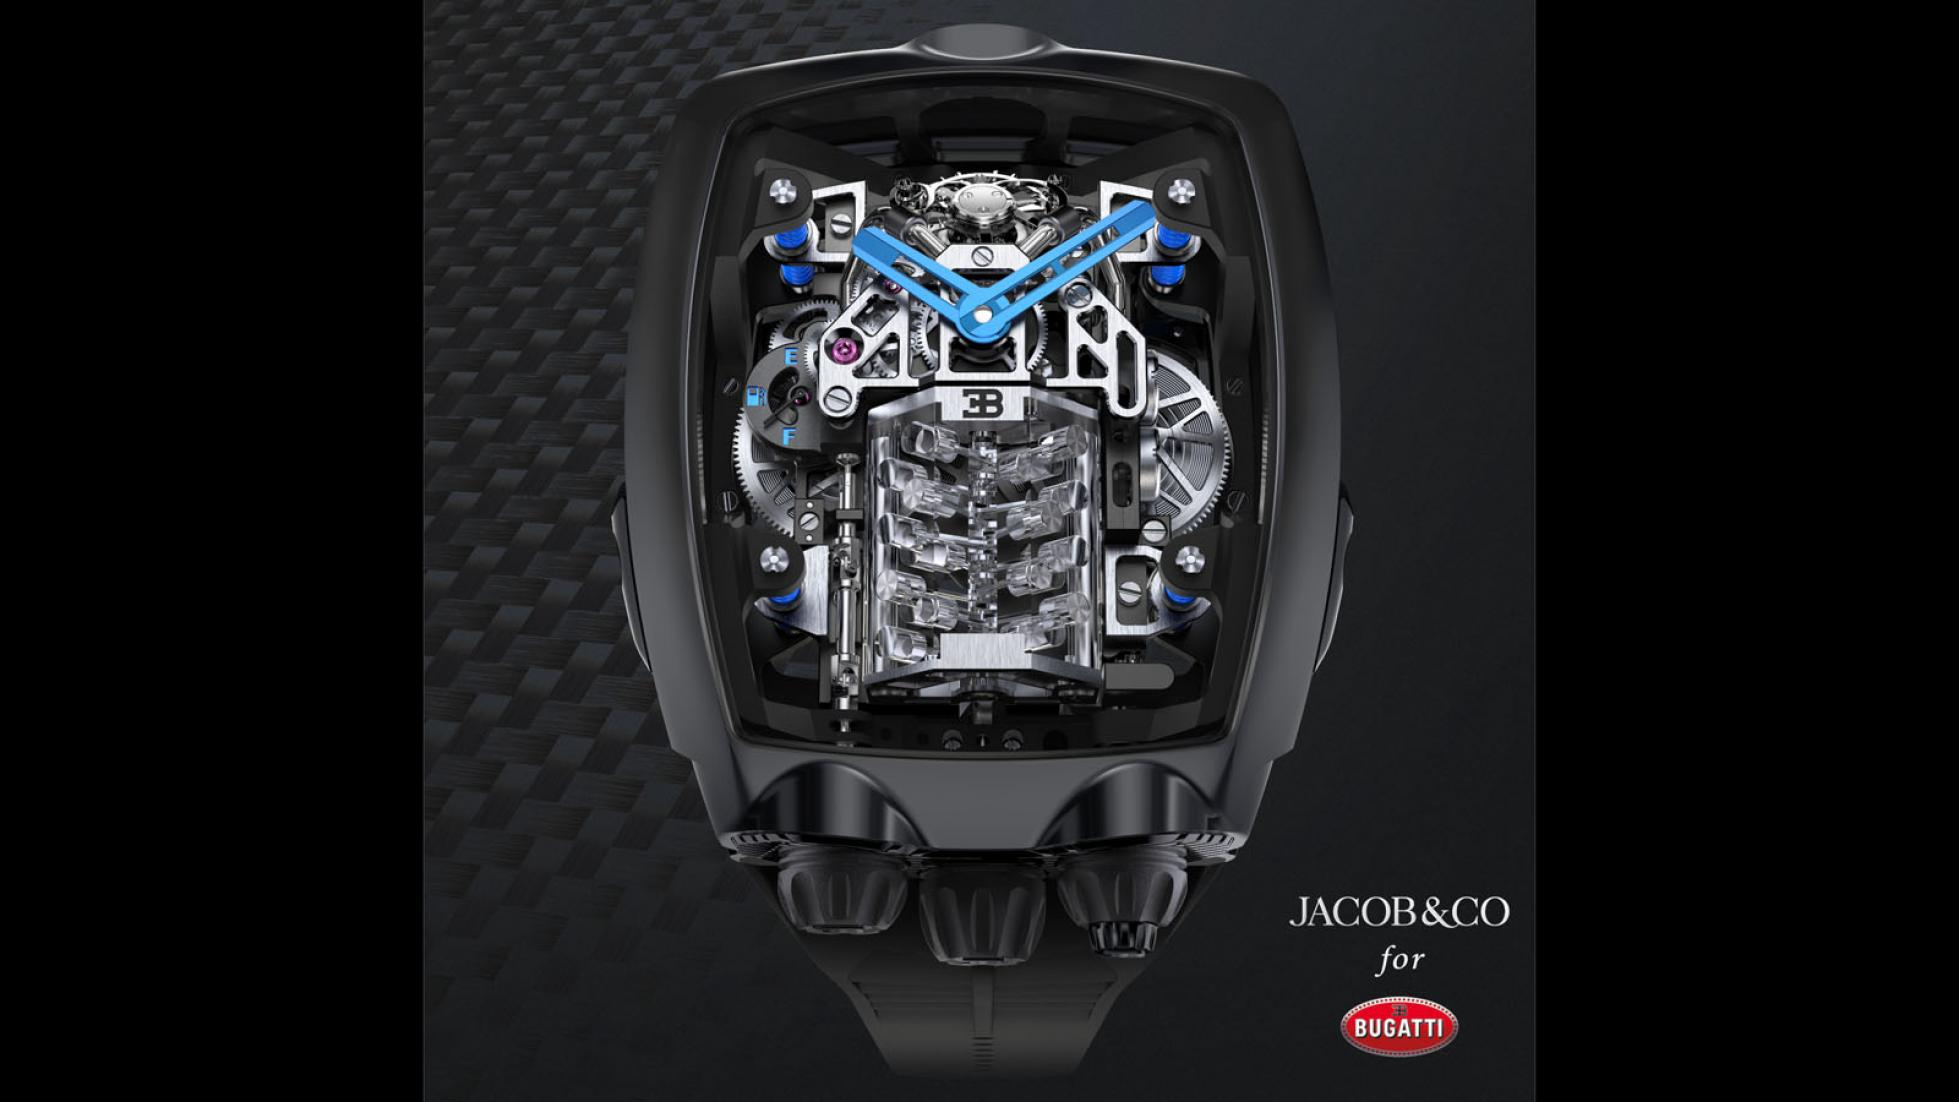 Jacob-Co-Bugatti-Chiron-Tourbillon-4